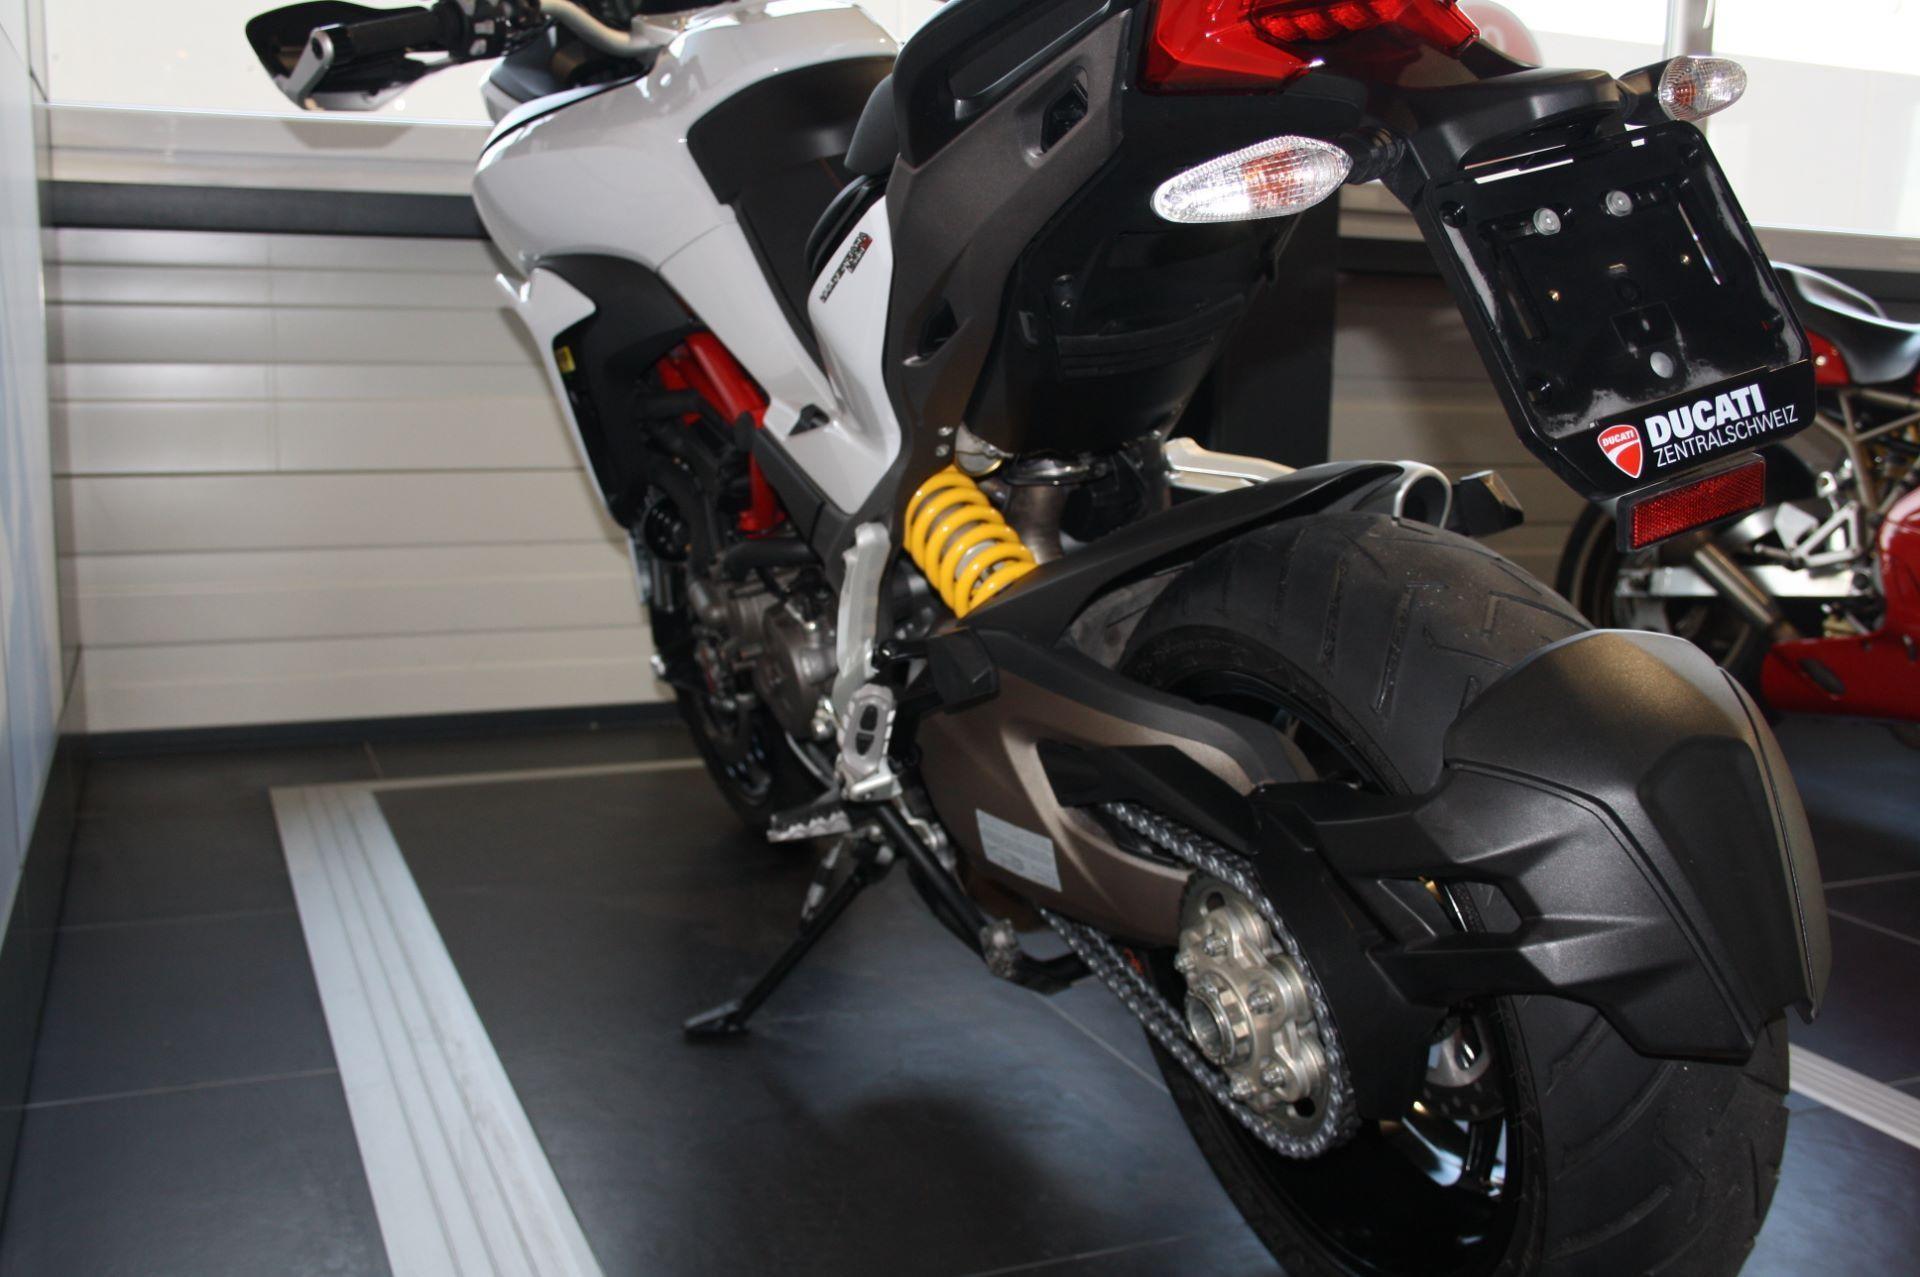 moto occasions acheter ducati 1200 multistrada abs ducati zentralschweiz perlen. Black Bedroom Furniture Sets. Home Design Ideas